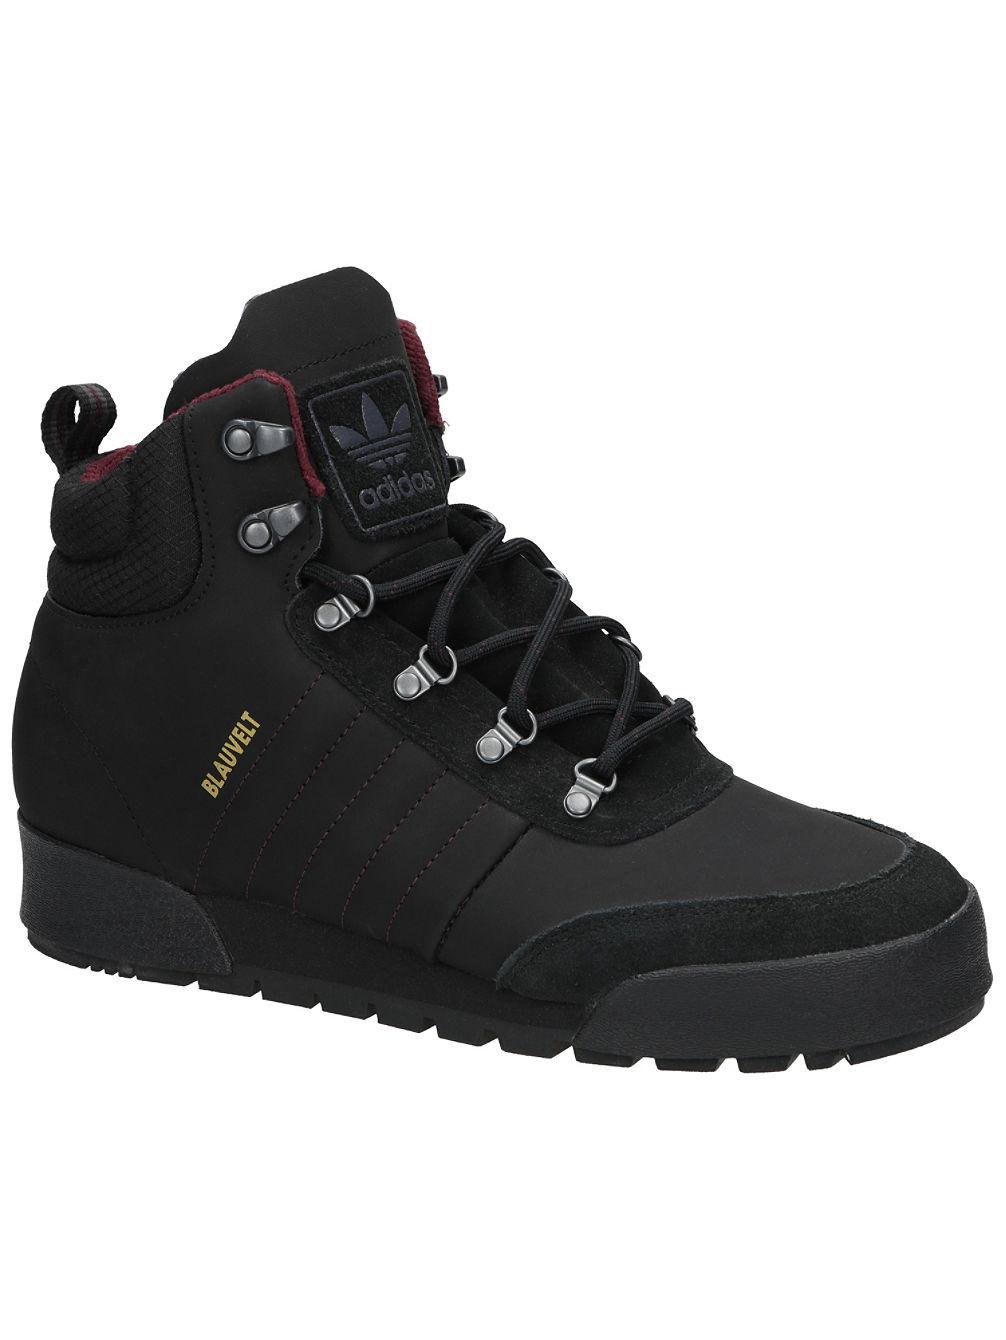 Adidas Snowboarding Jake Boot   Skate Shoes